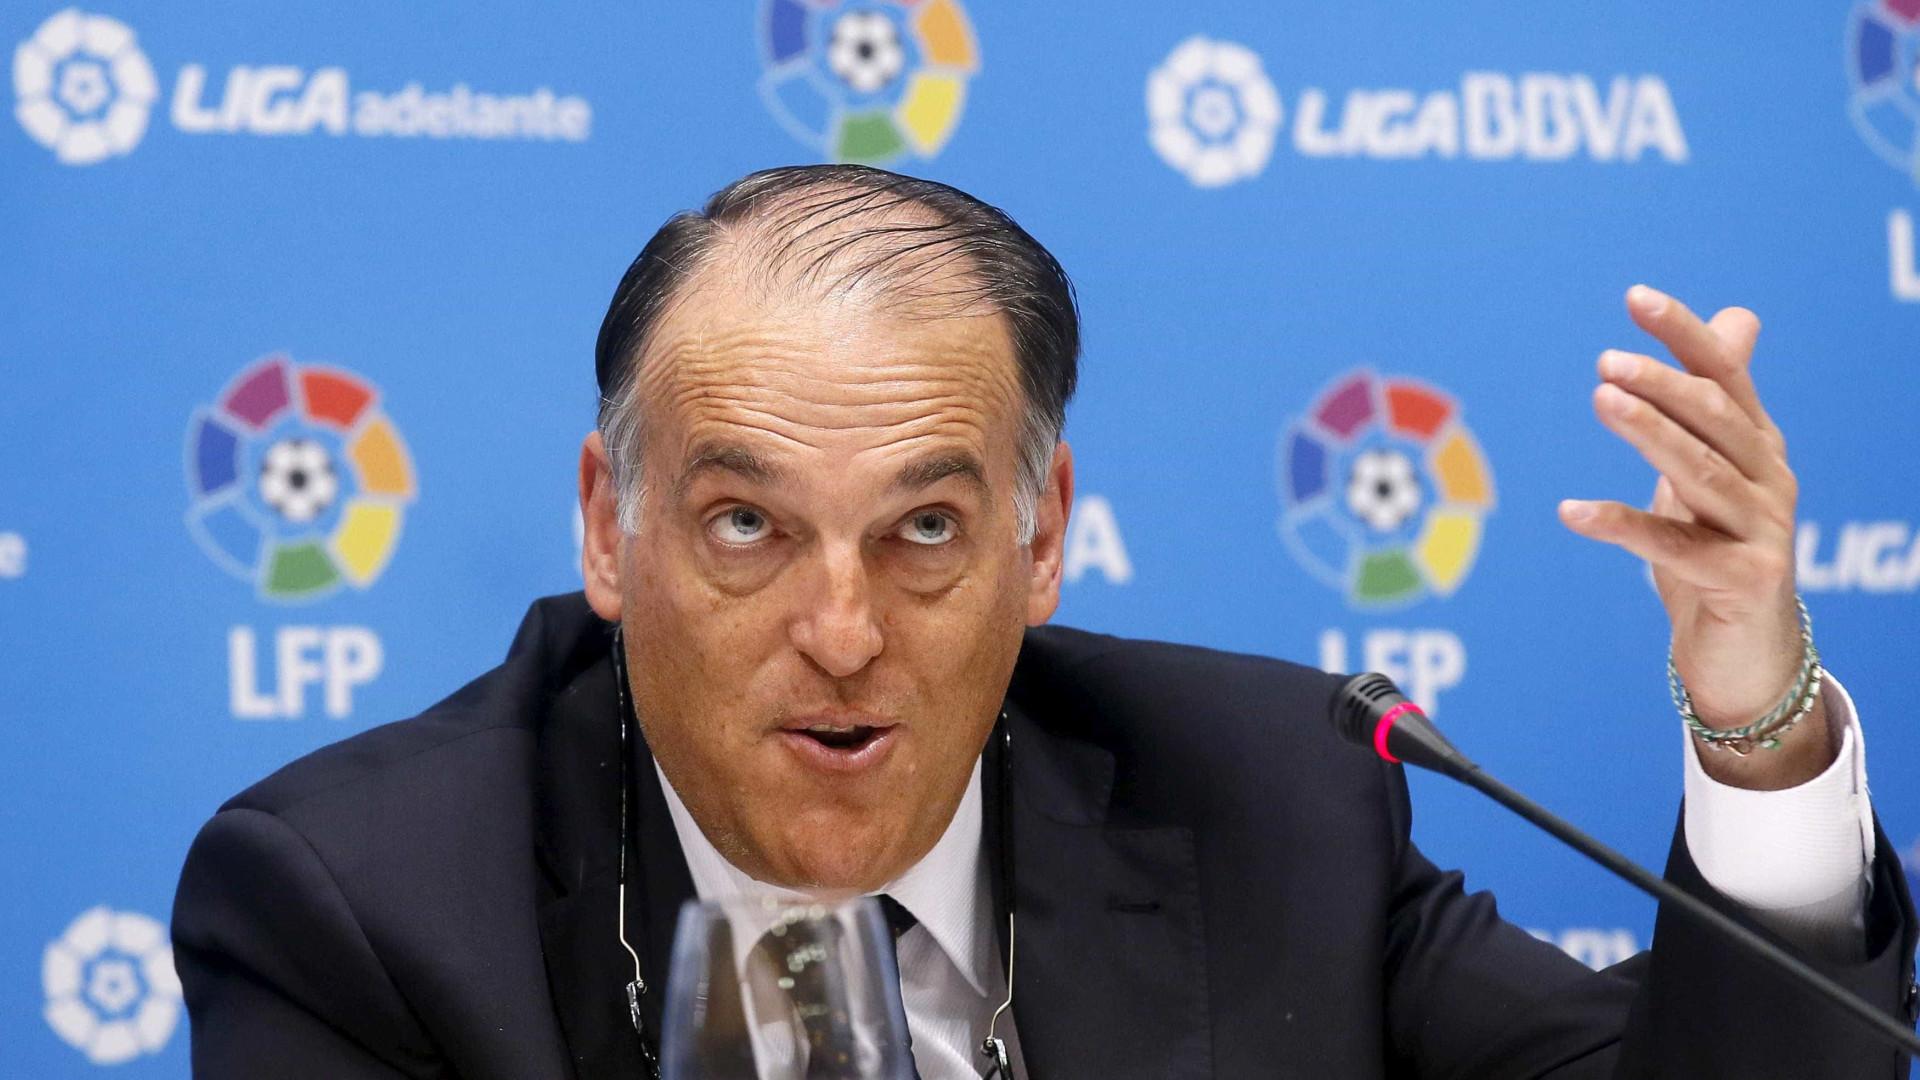 La Liga terá vídeo-árbitro na próxima temporada